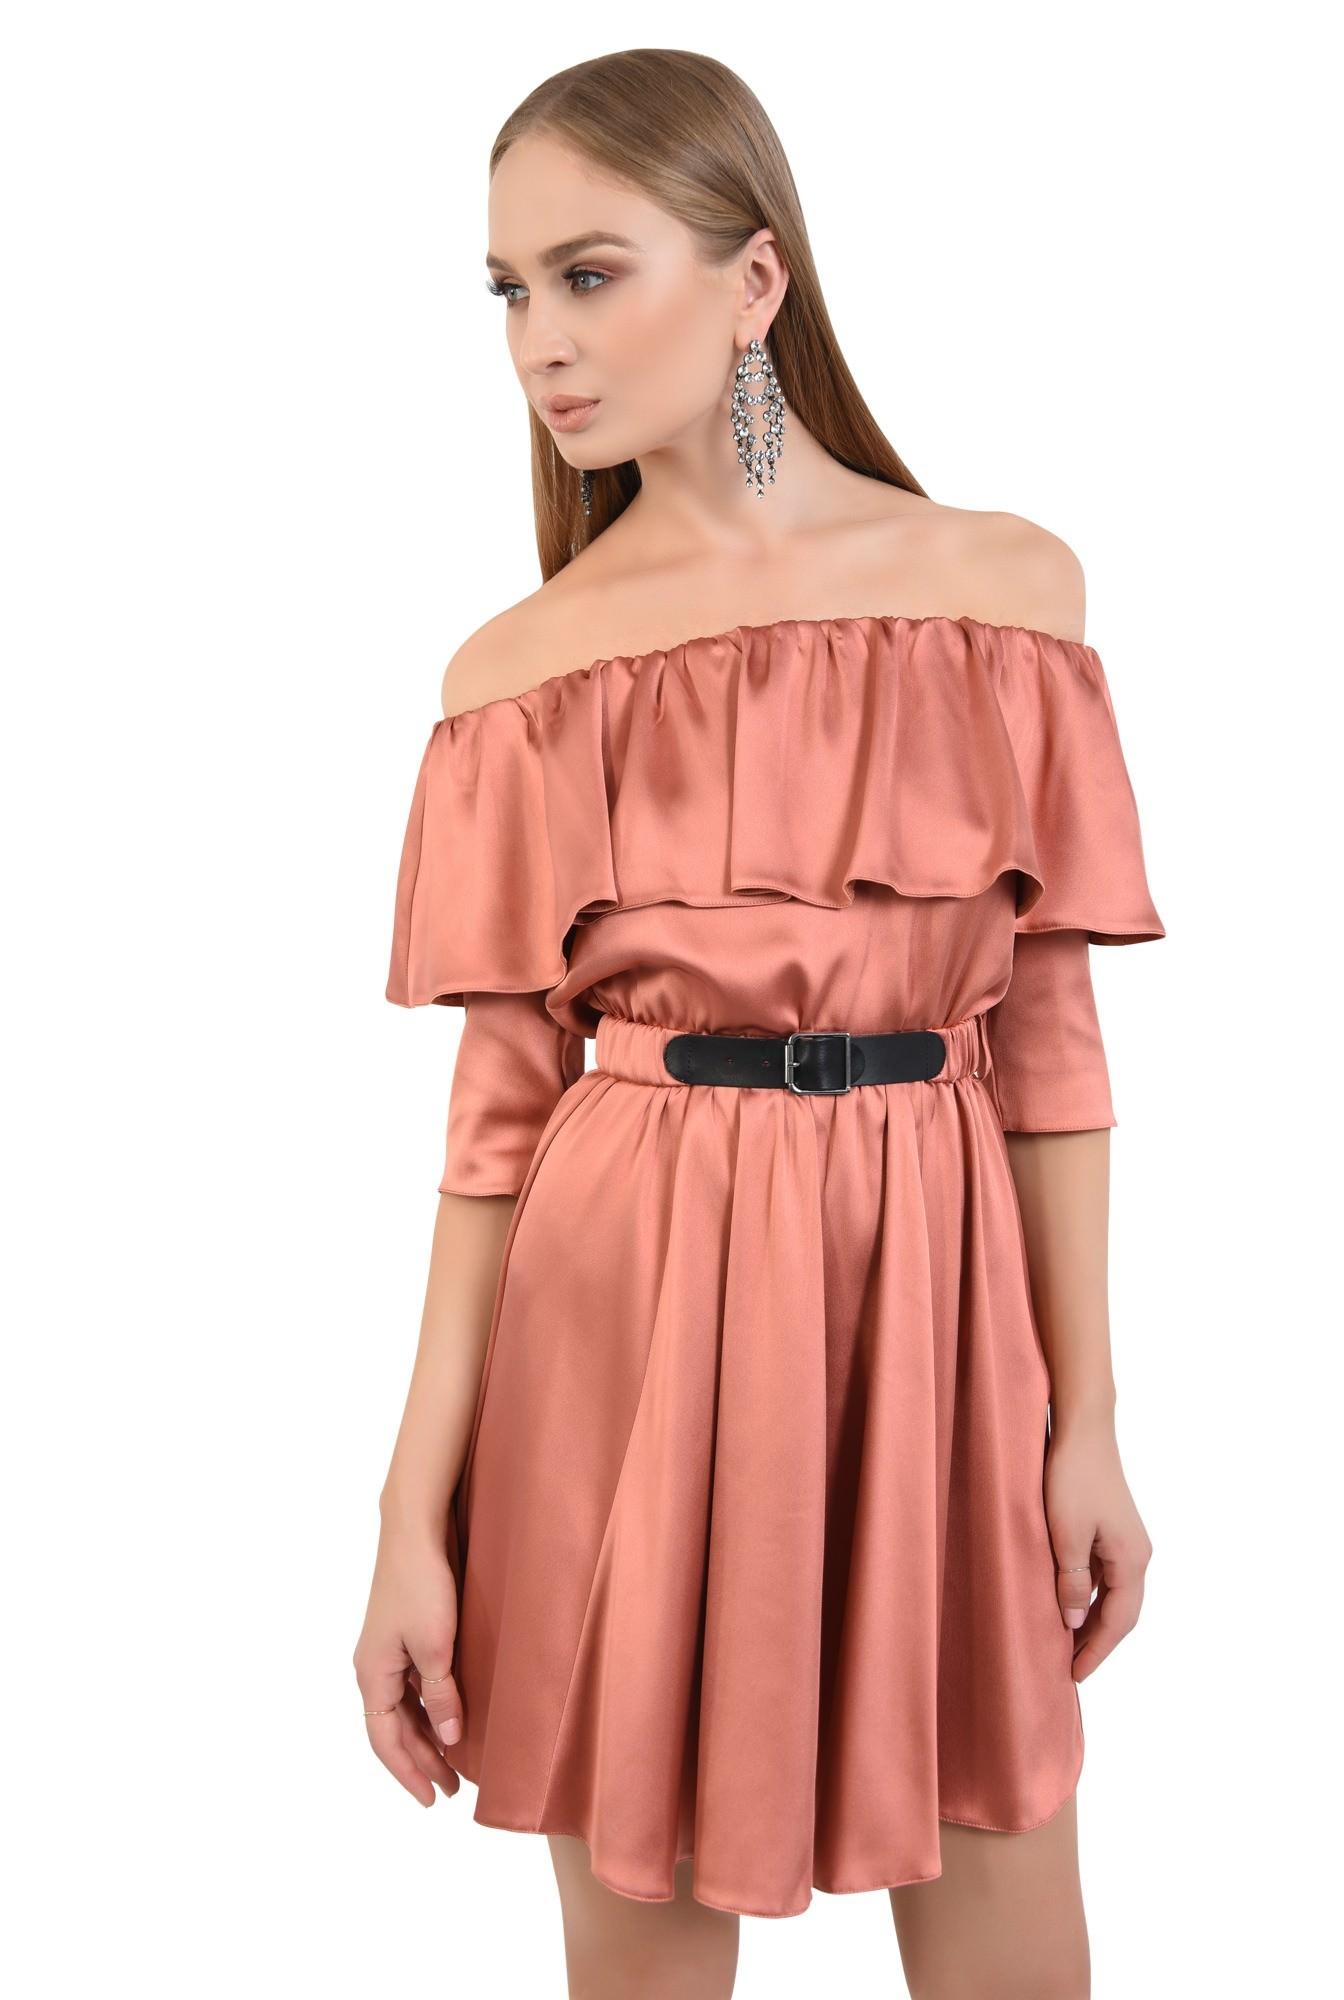 0 - rochie eleganta, scurta, clos, satin, curea